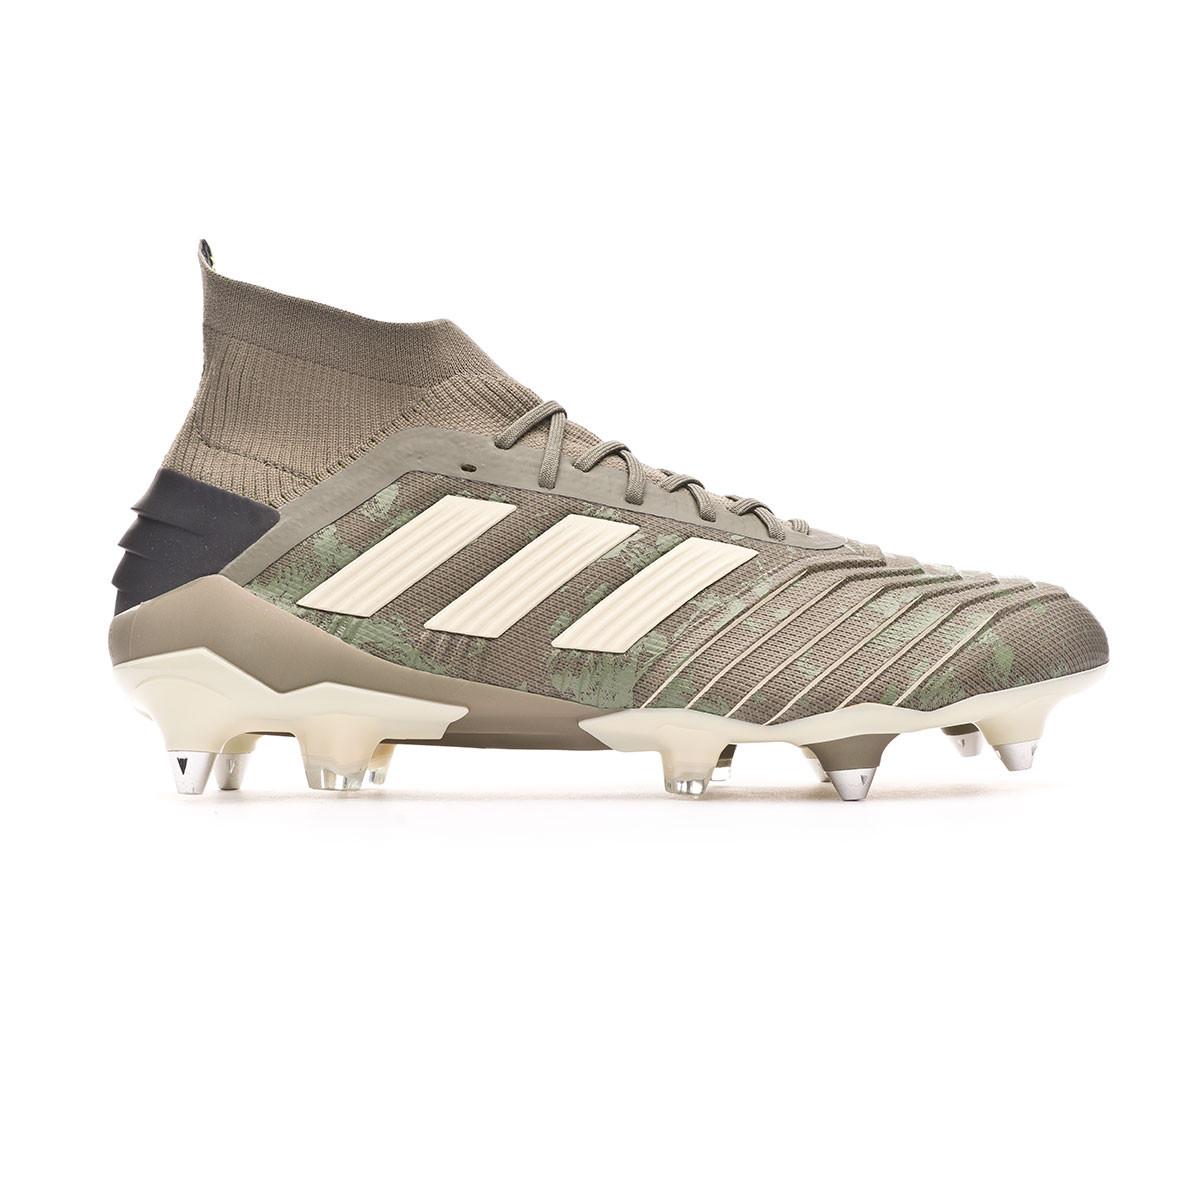 Chaussure de foot adidas Predator 19.1 SG Legacy green Sand